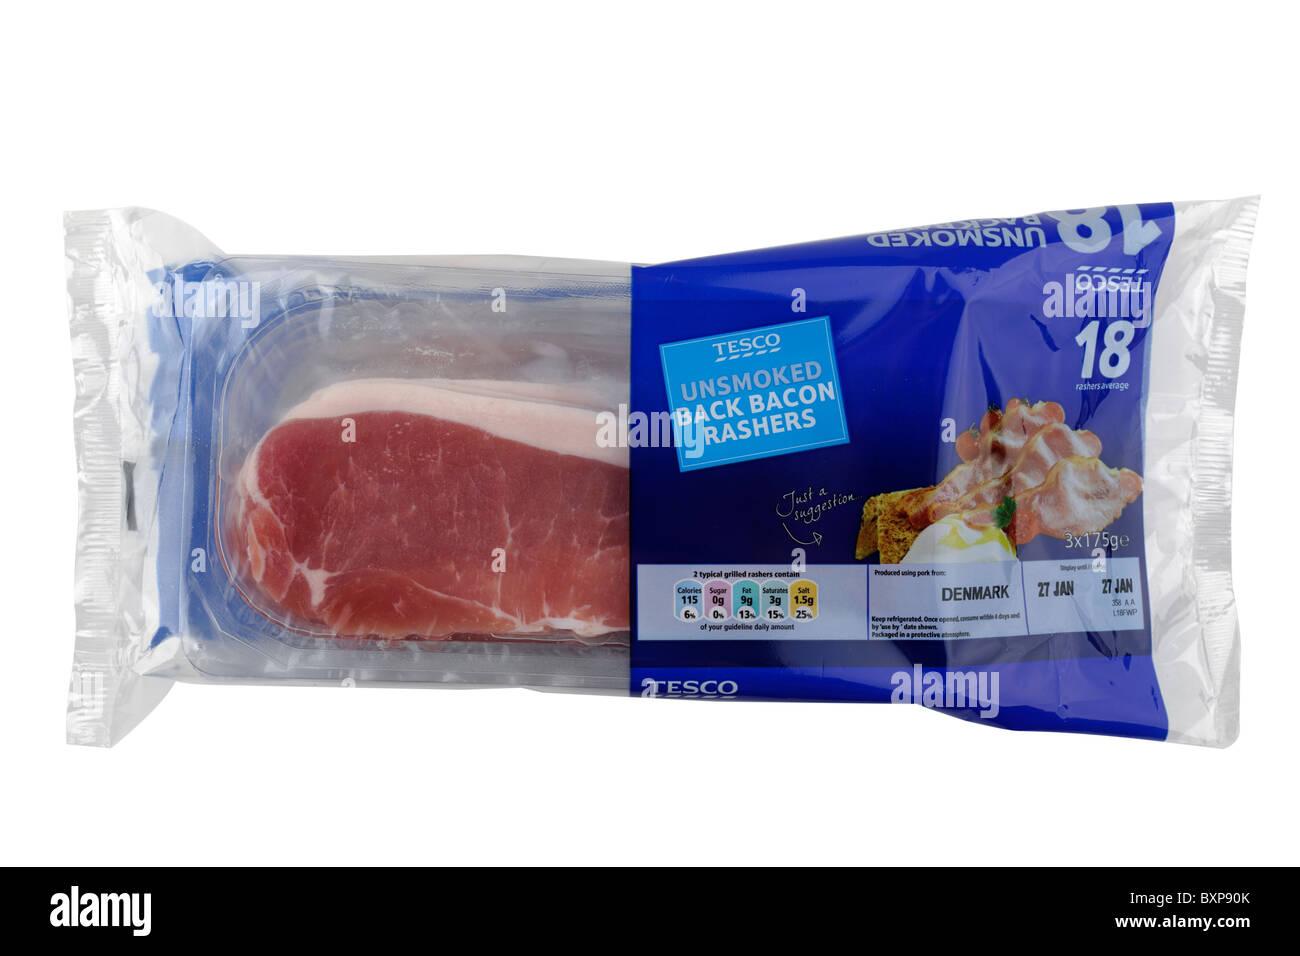 Pack of Tesco 18 rasher unsmoked bacon from Denmark - Stock Image